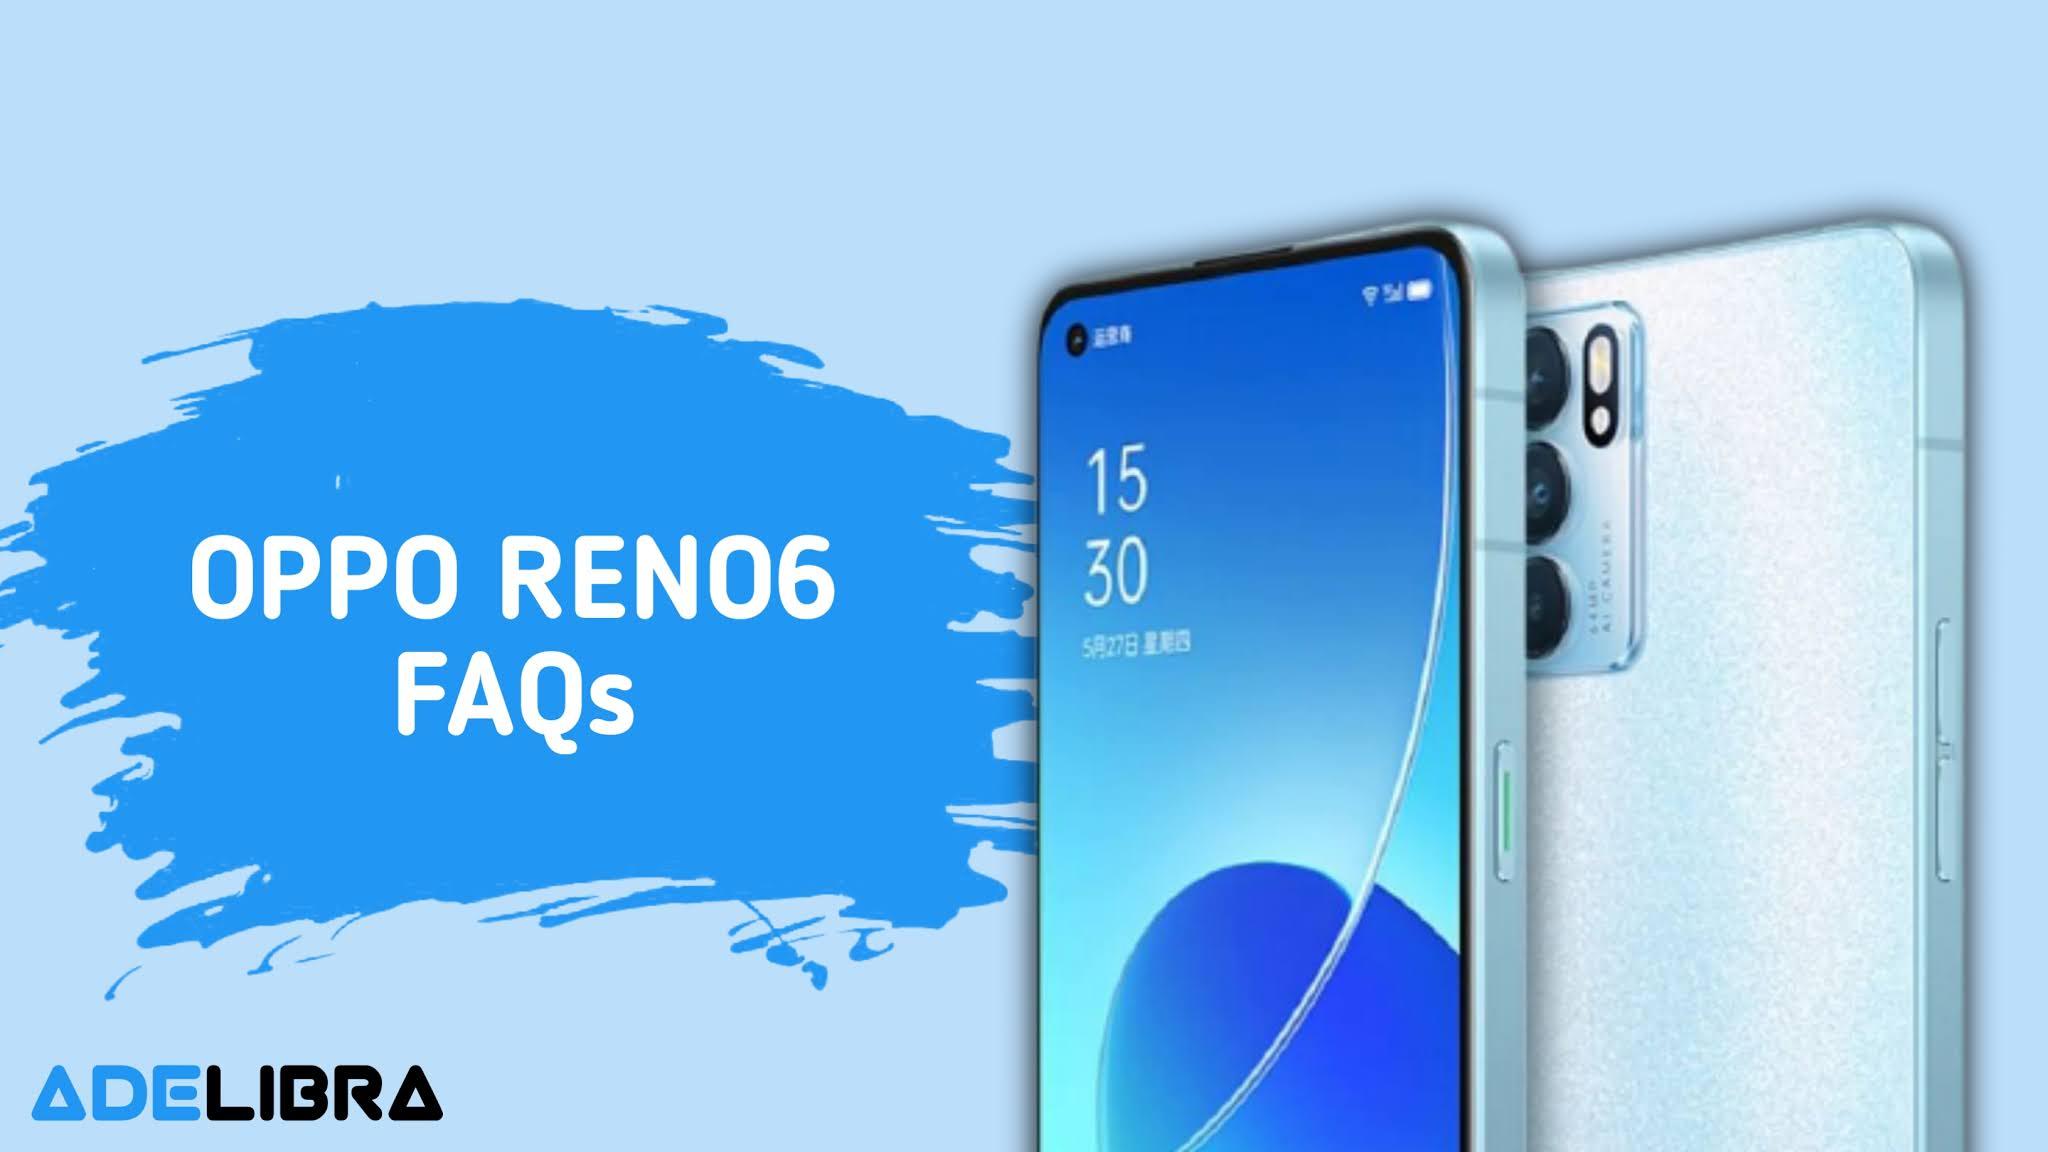 Oppo Reno 6 5G FAQs